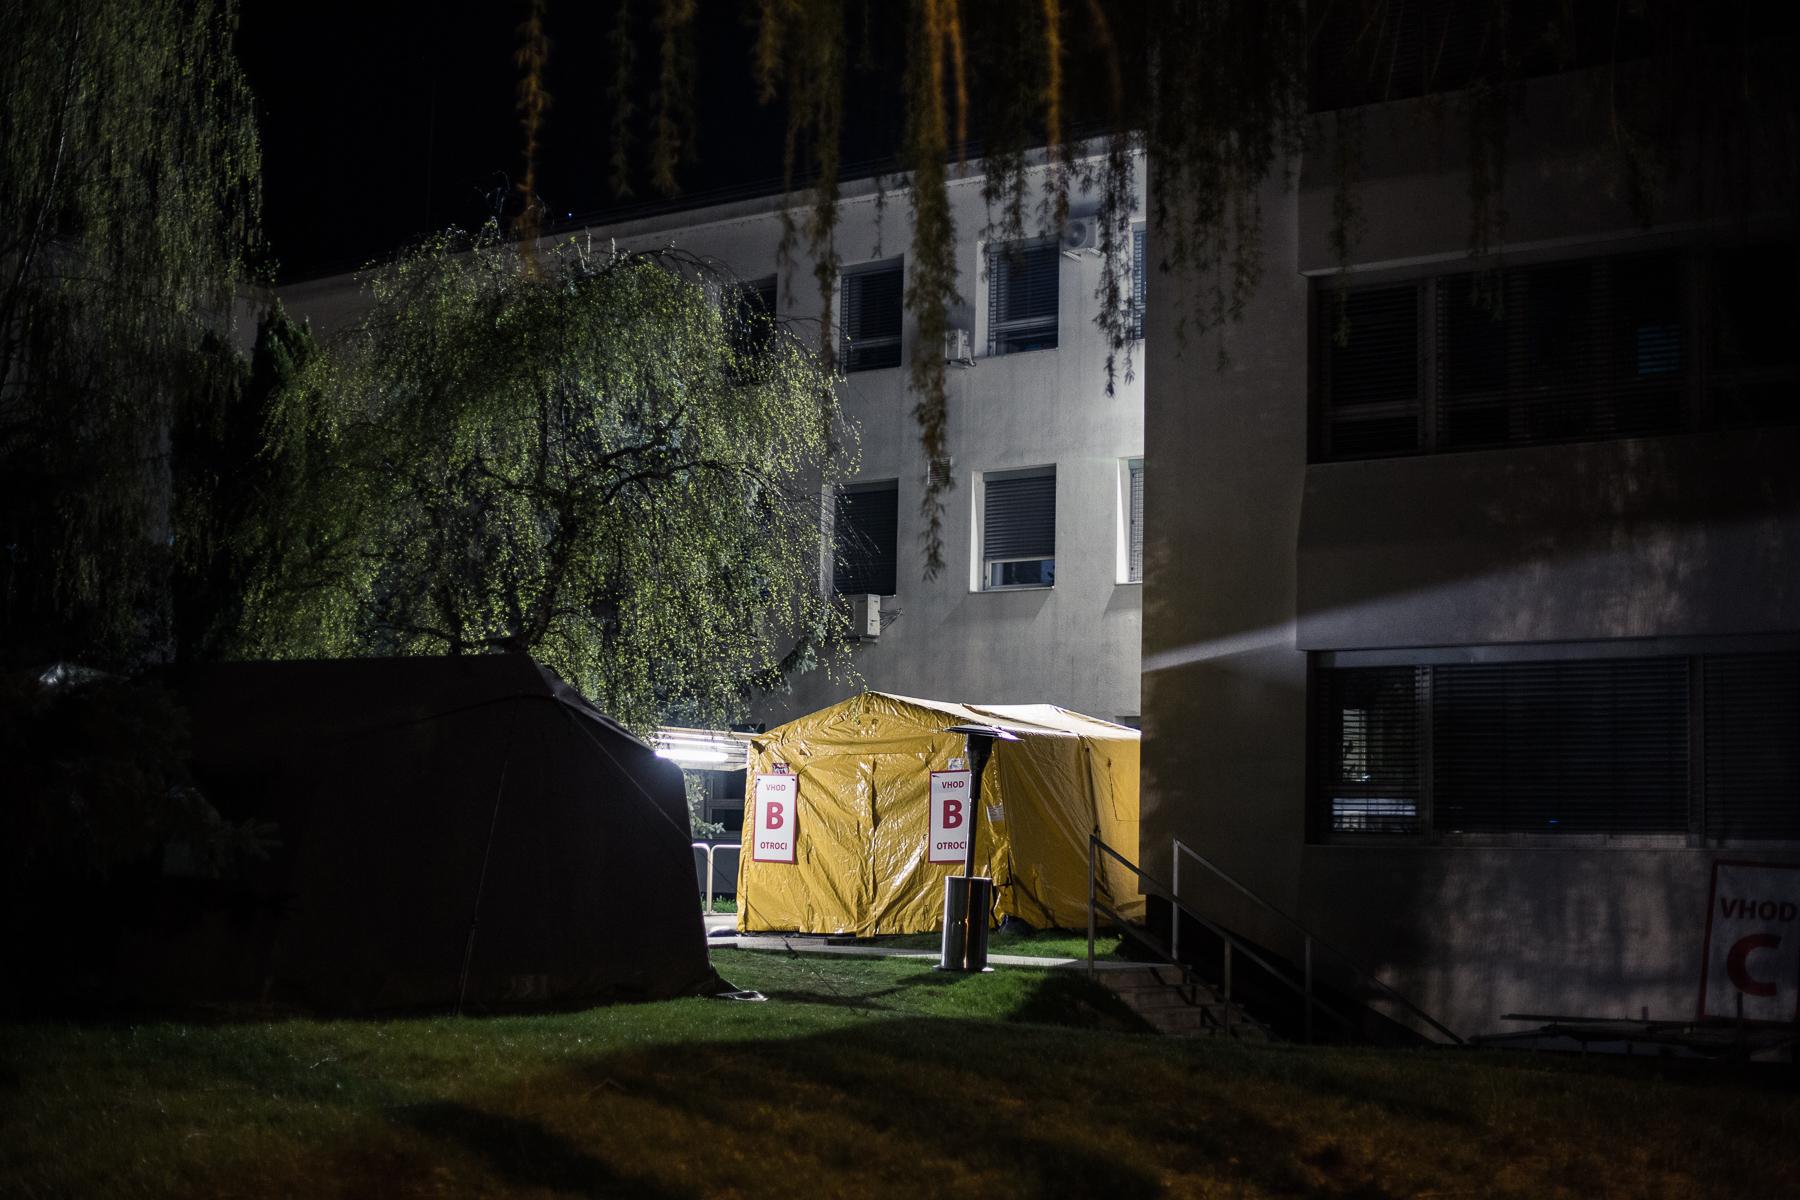 A coronavirus (COVID-19) testing tent outside a medical center in Kranj, Slovenia, on April 12, 2020.